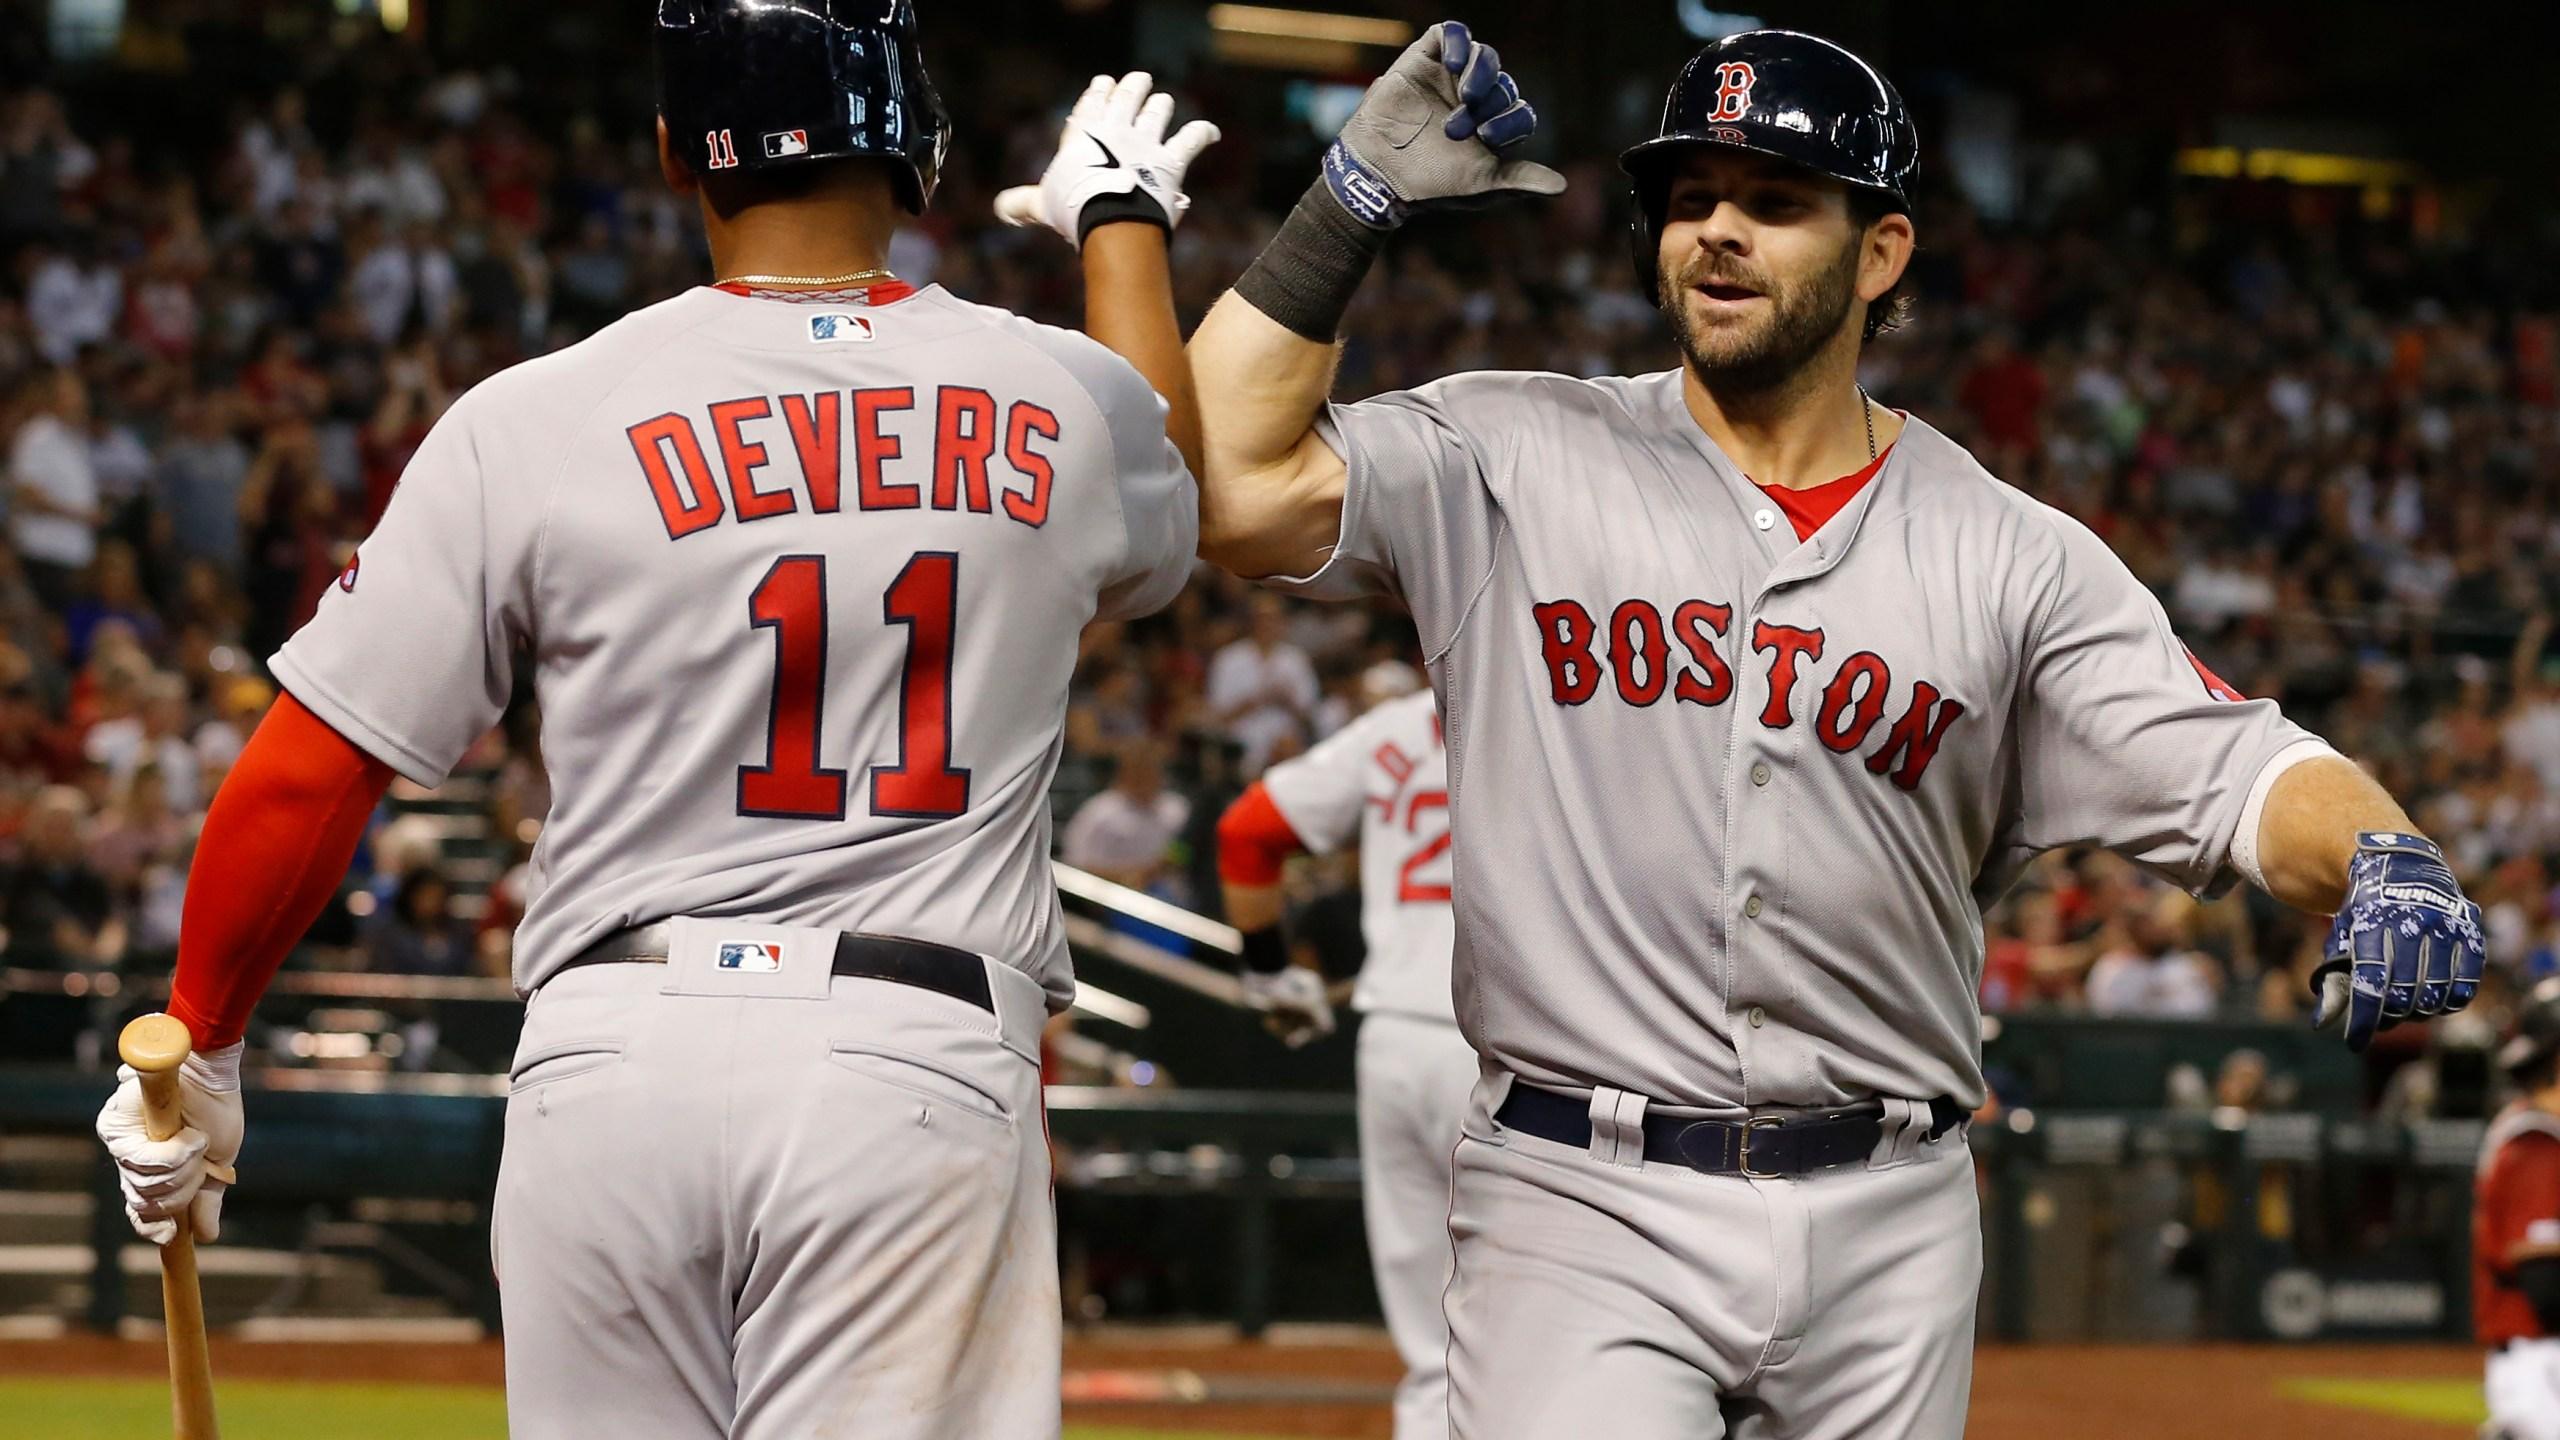 Red_Sox_Diamondbacks_Baseball_39145-159532.jpg96677280